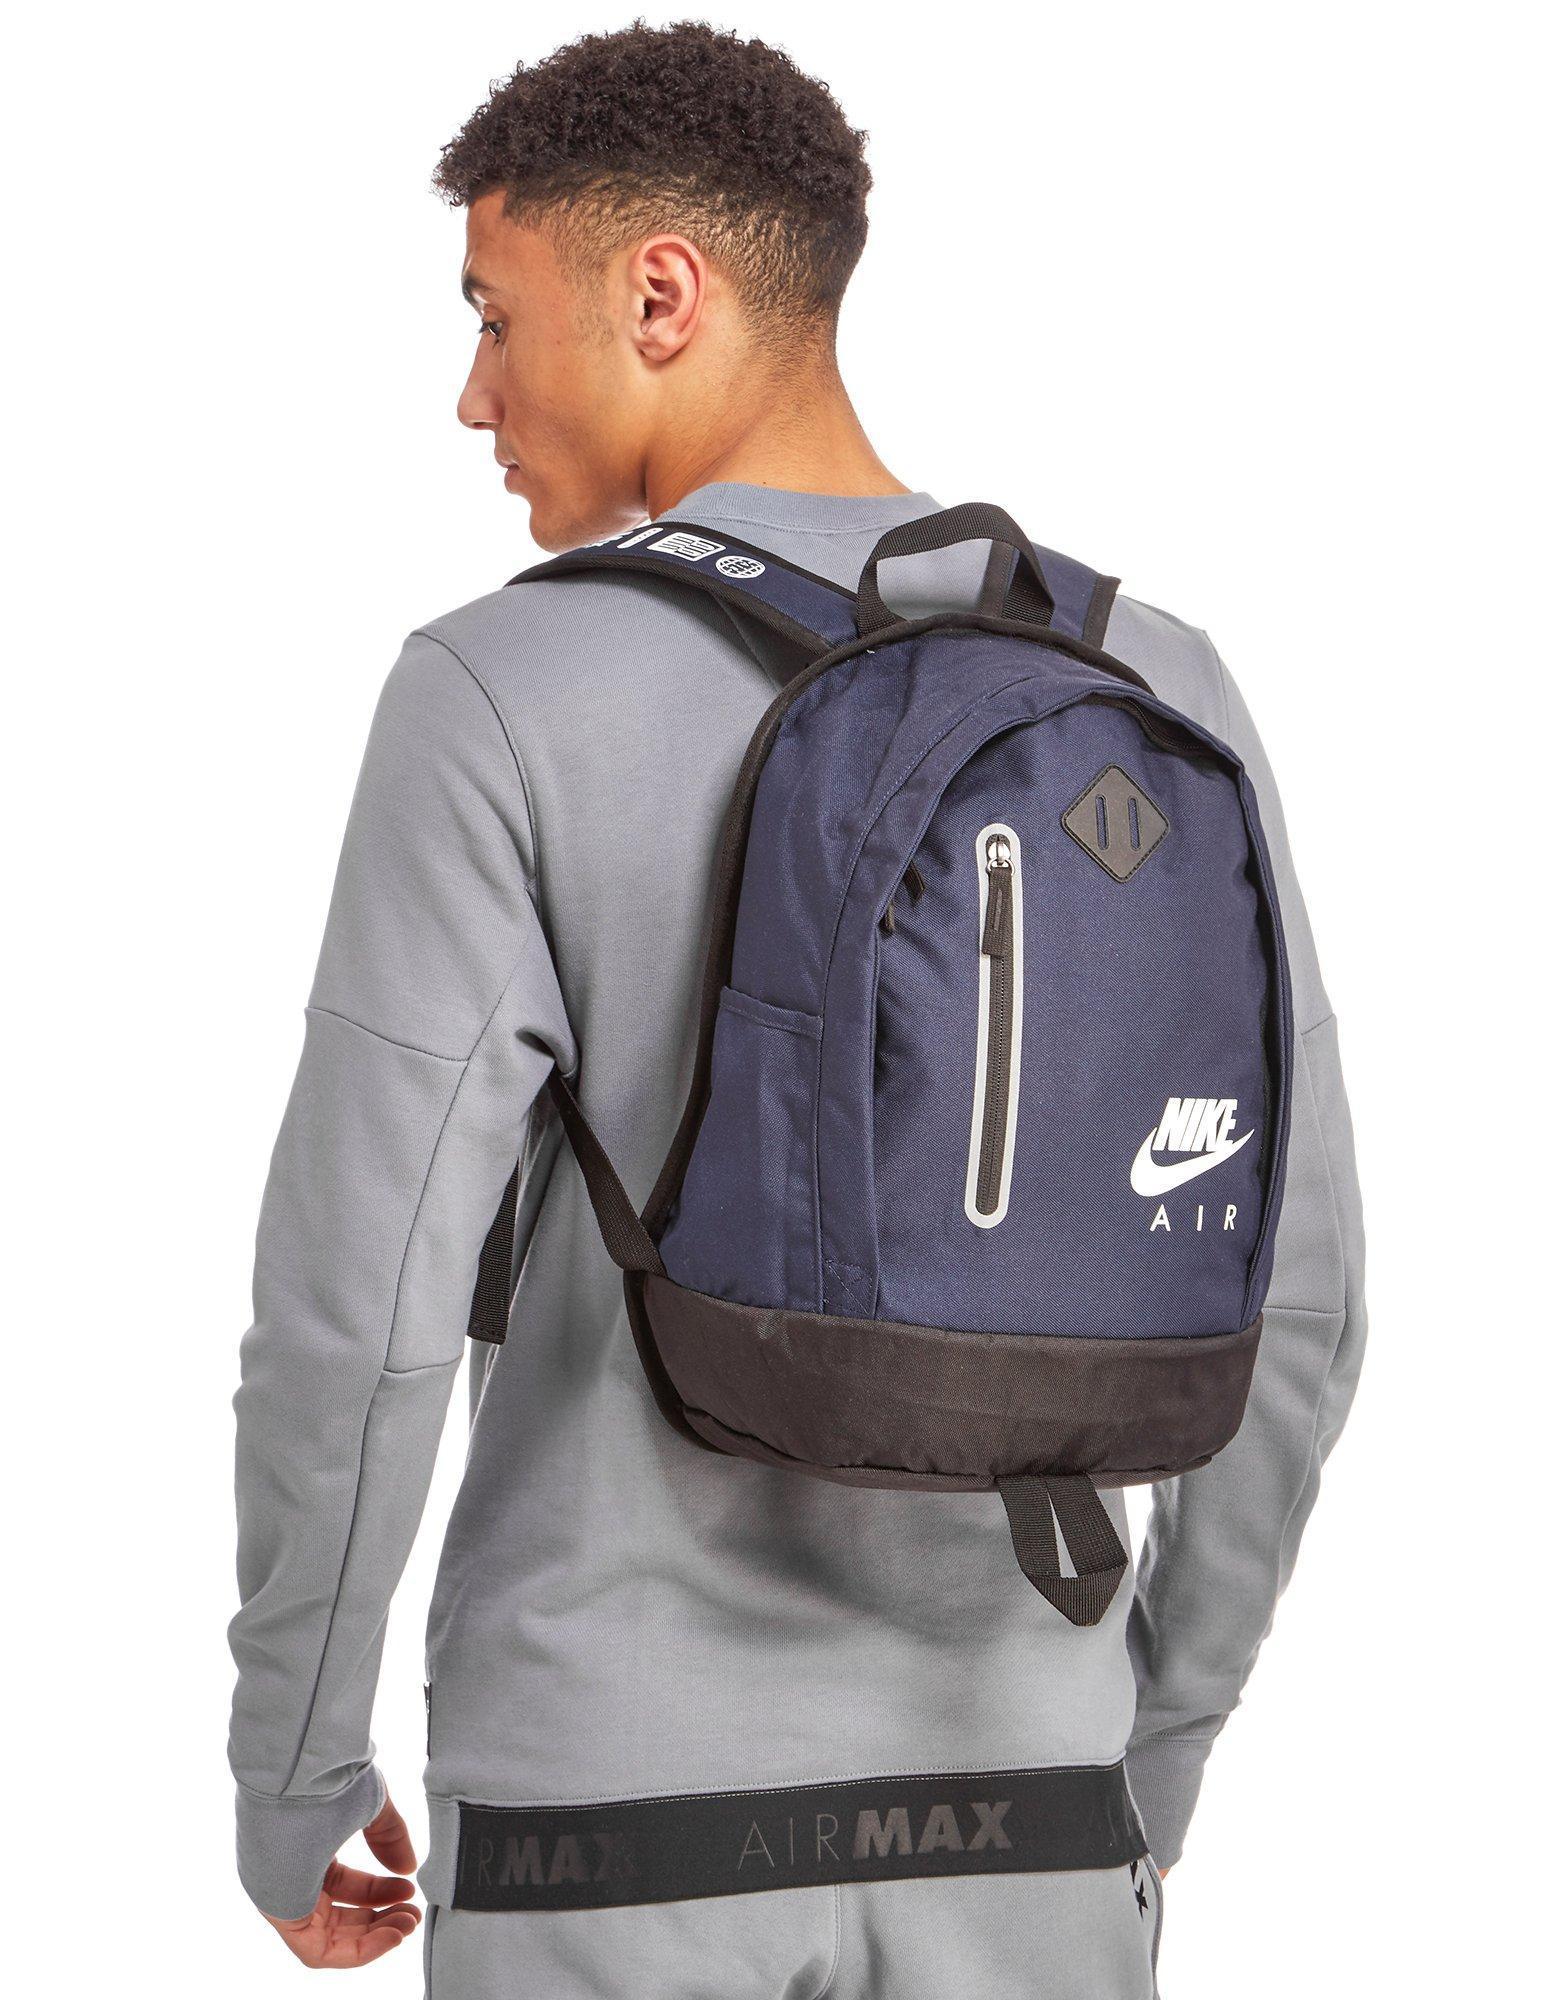 da3977195be3 Nike Cheyenne Backpack in Blue for Men - Lyst